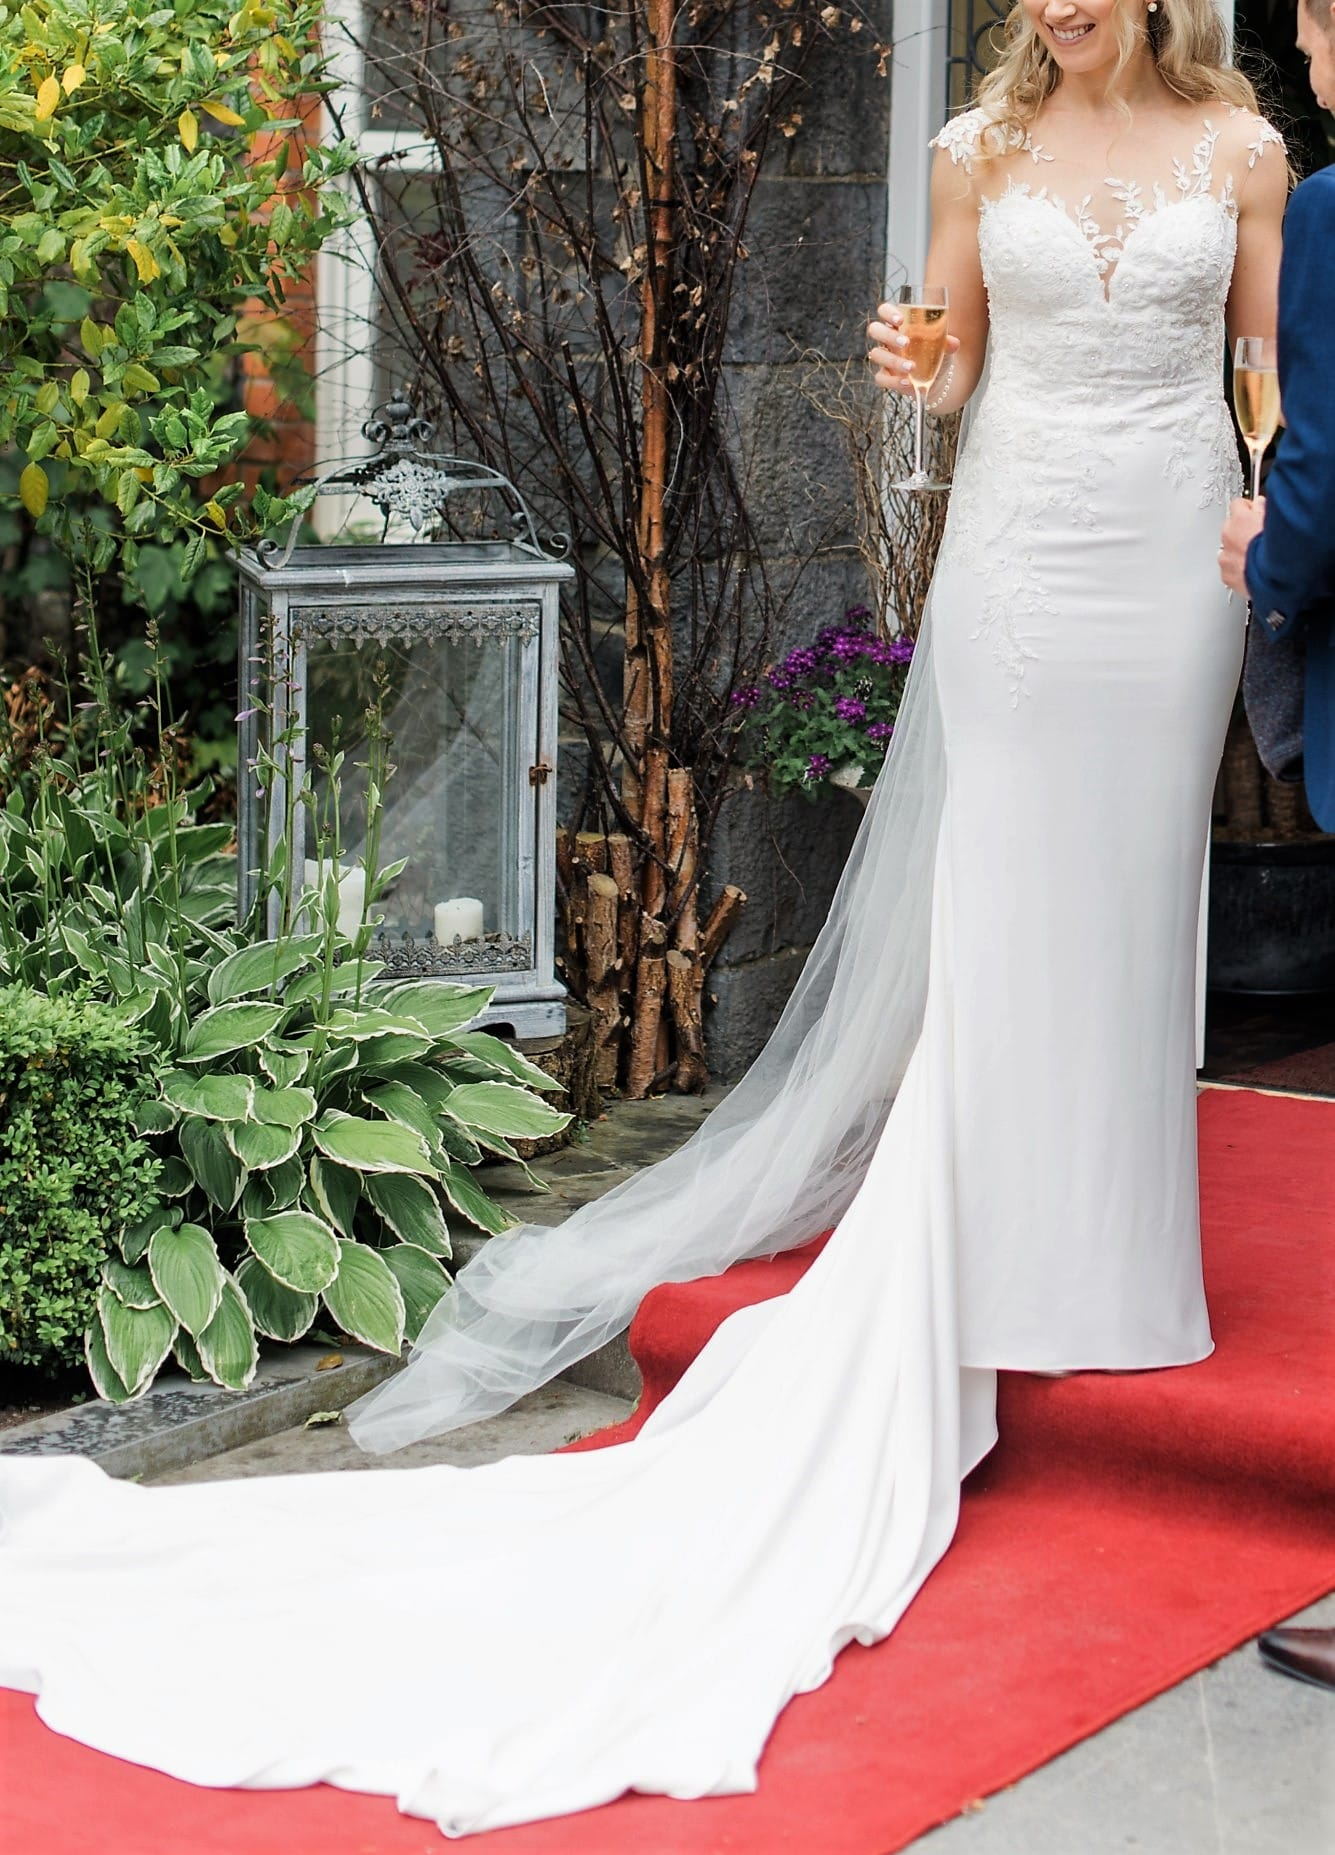 Dando London Adoring Gown Sell My Wedding Dress Online